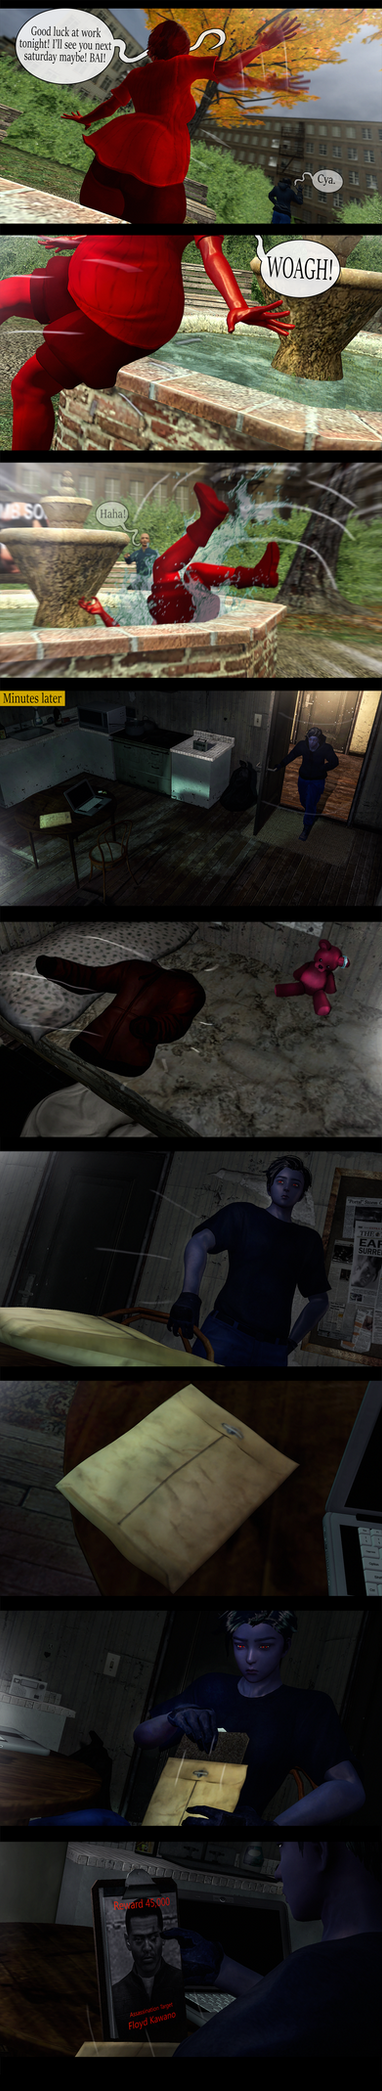 Rosing Violet - Arc 1 - Page 12 by LemurfotArt